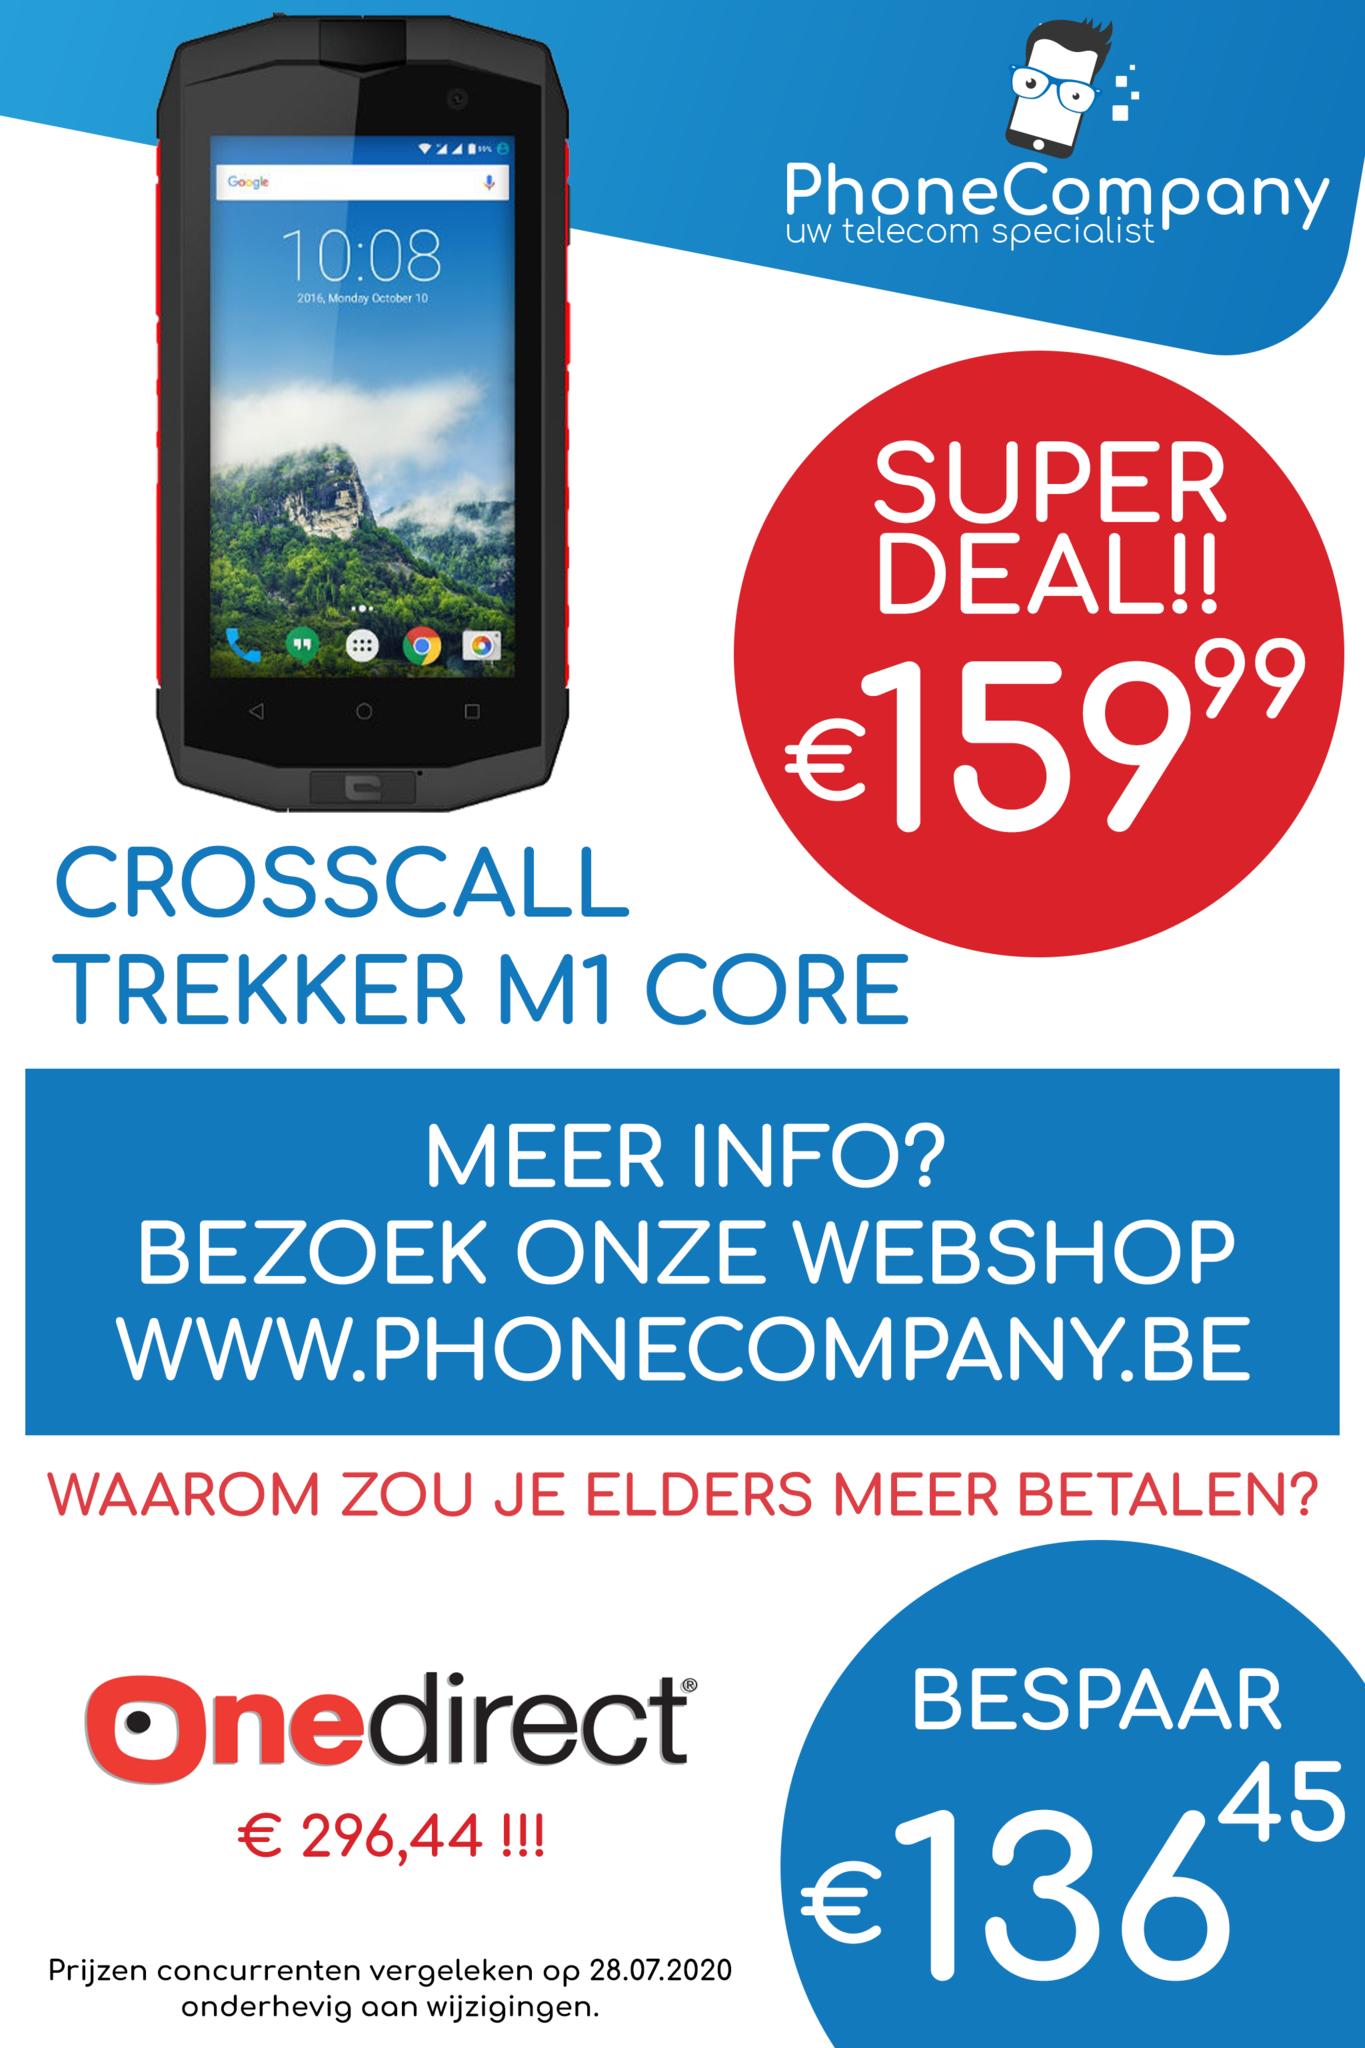 Crosscall Trekker M1 Core